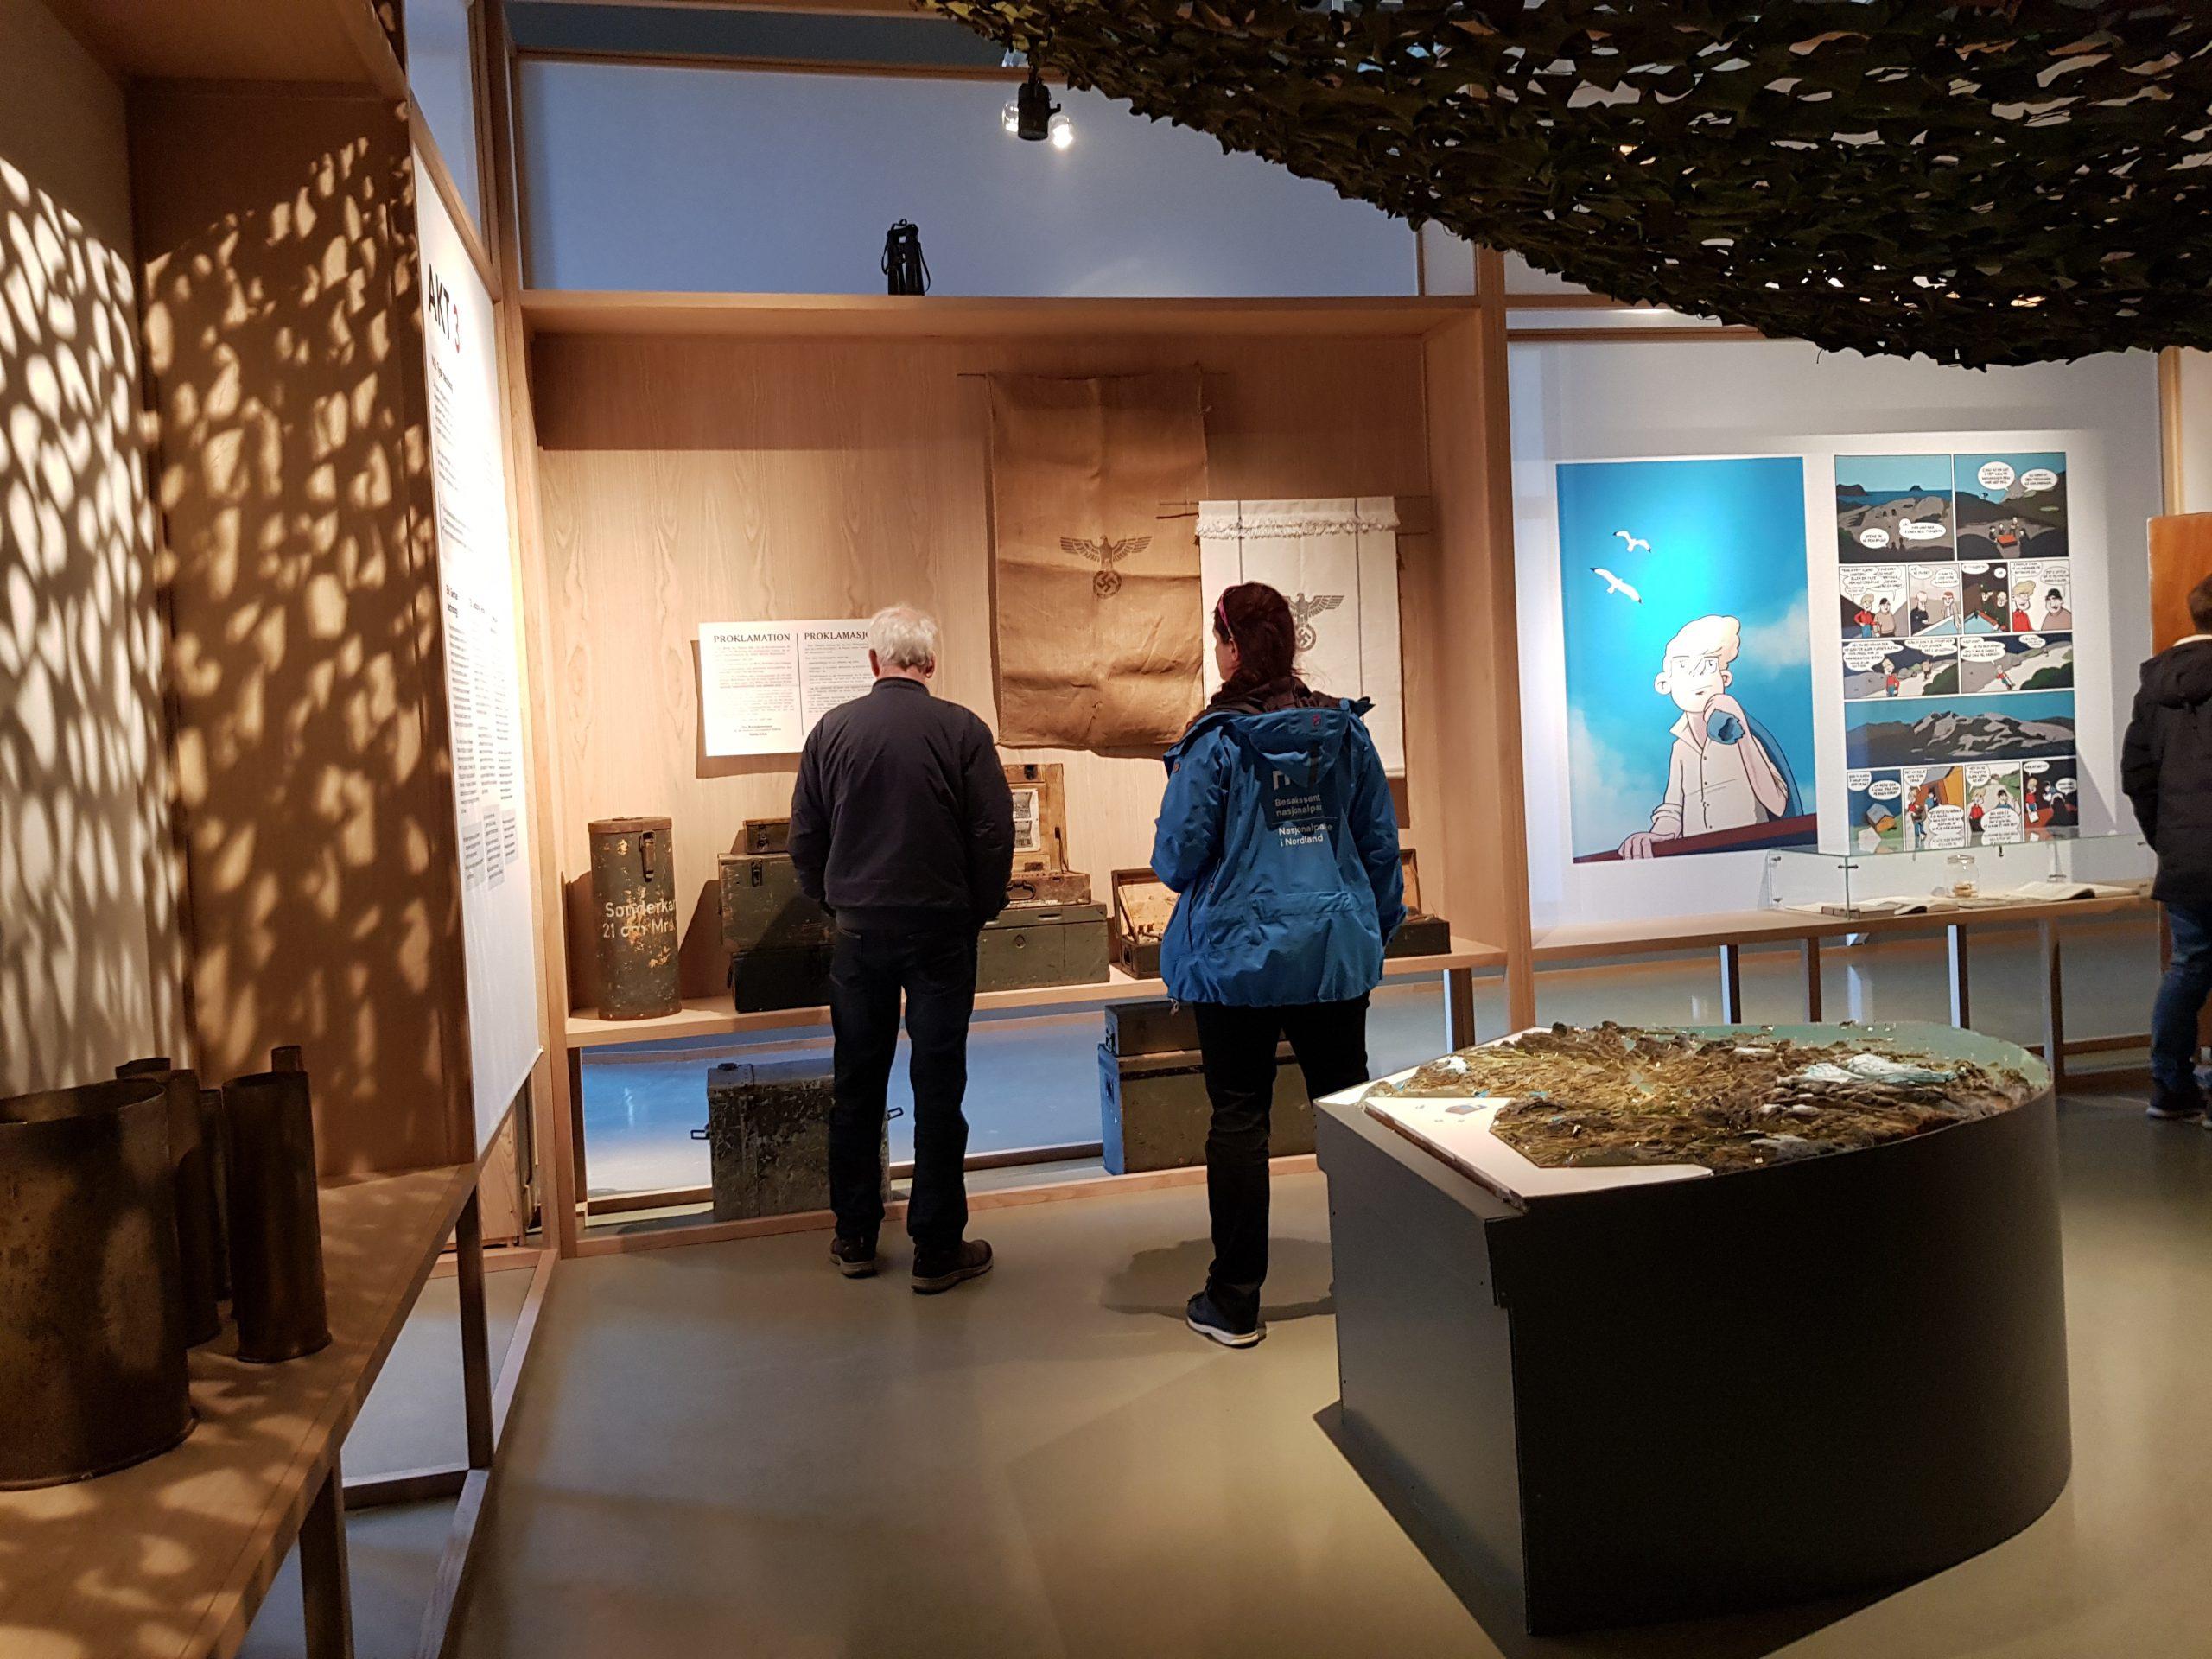 Utstillingen på Grønsvik kystfort, Lurøy